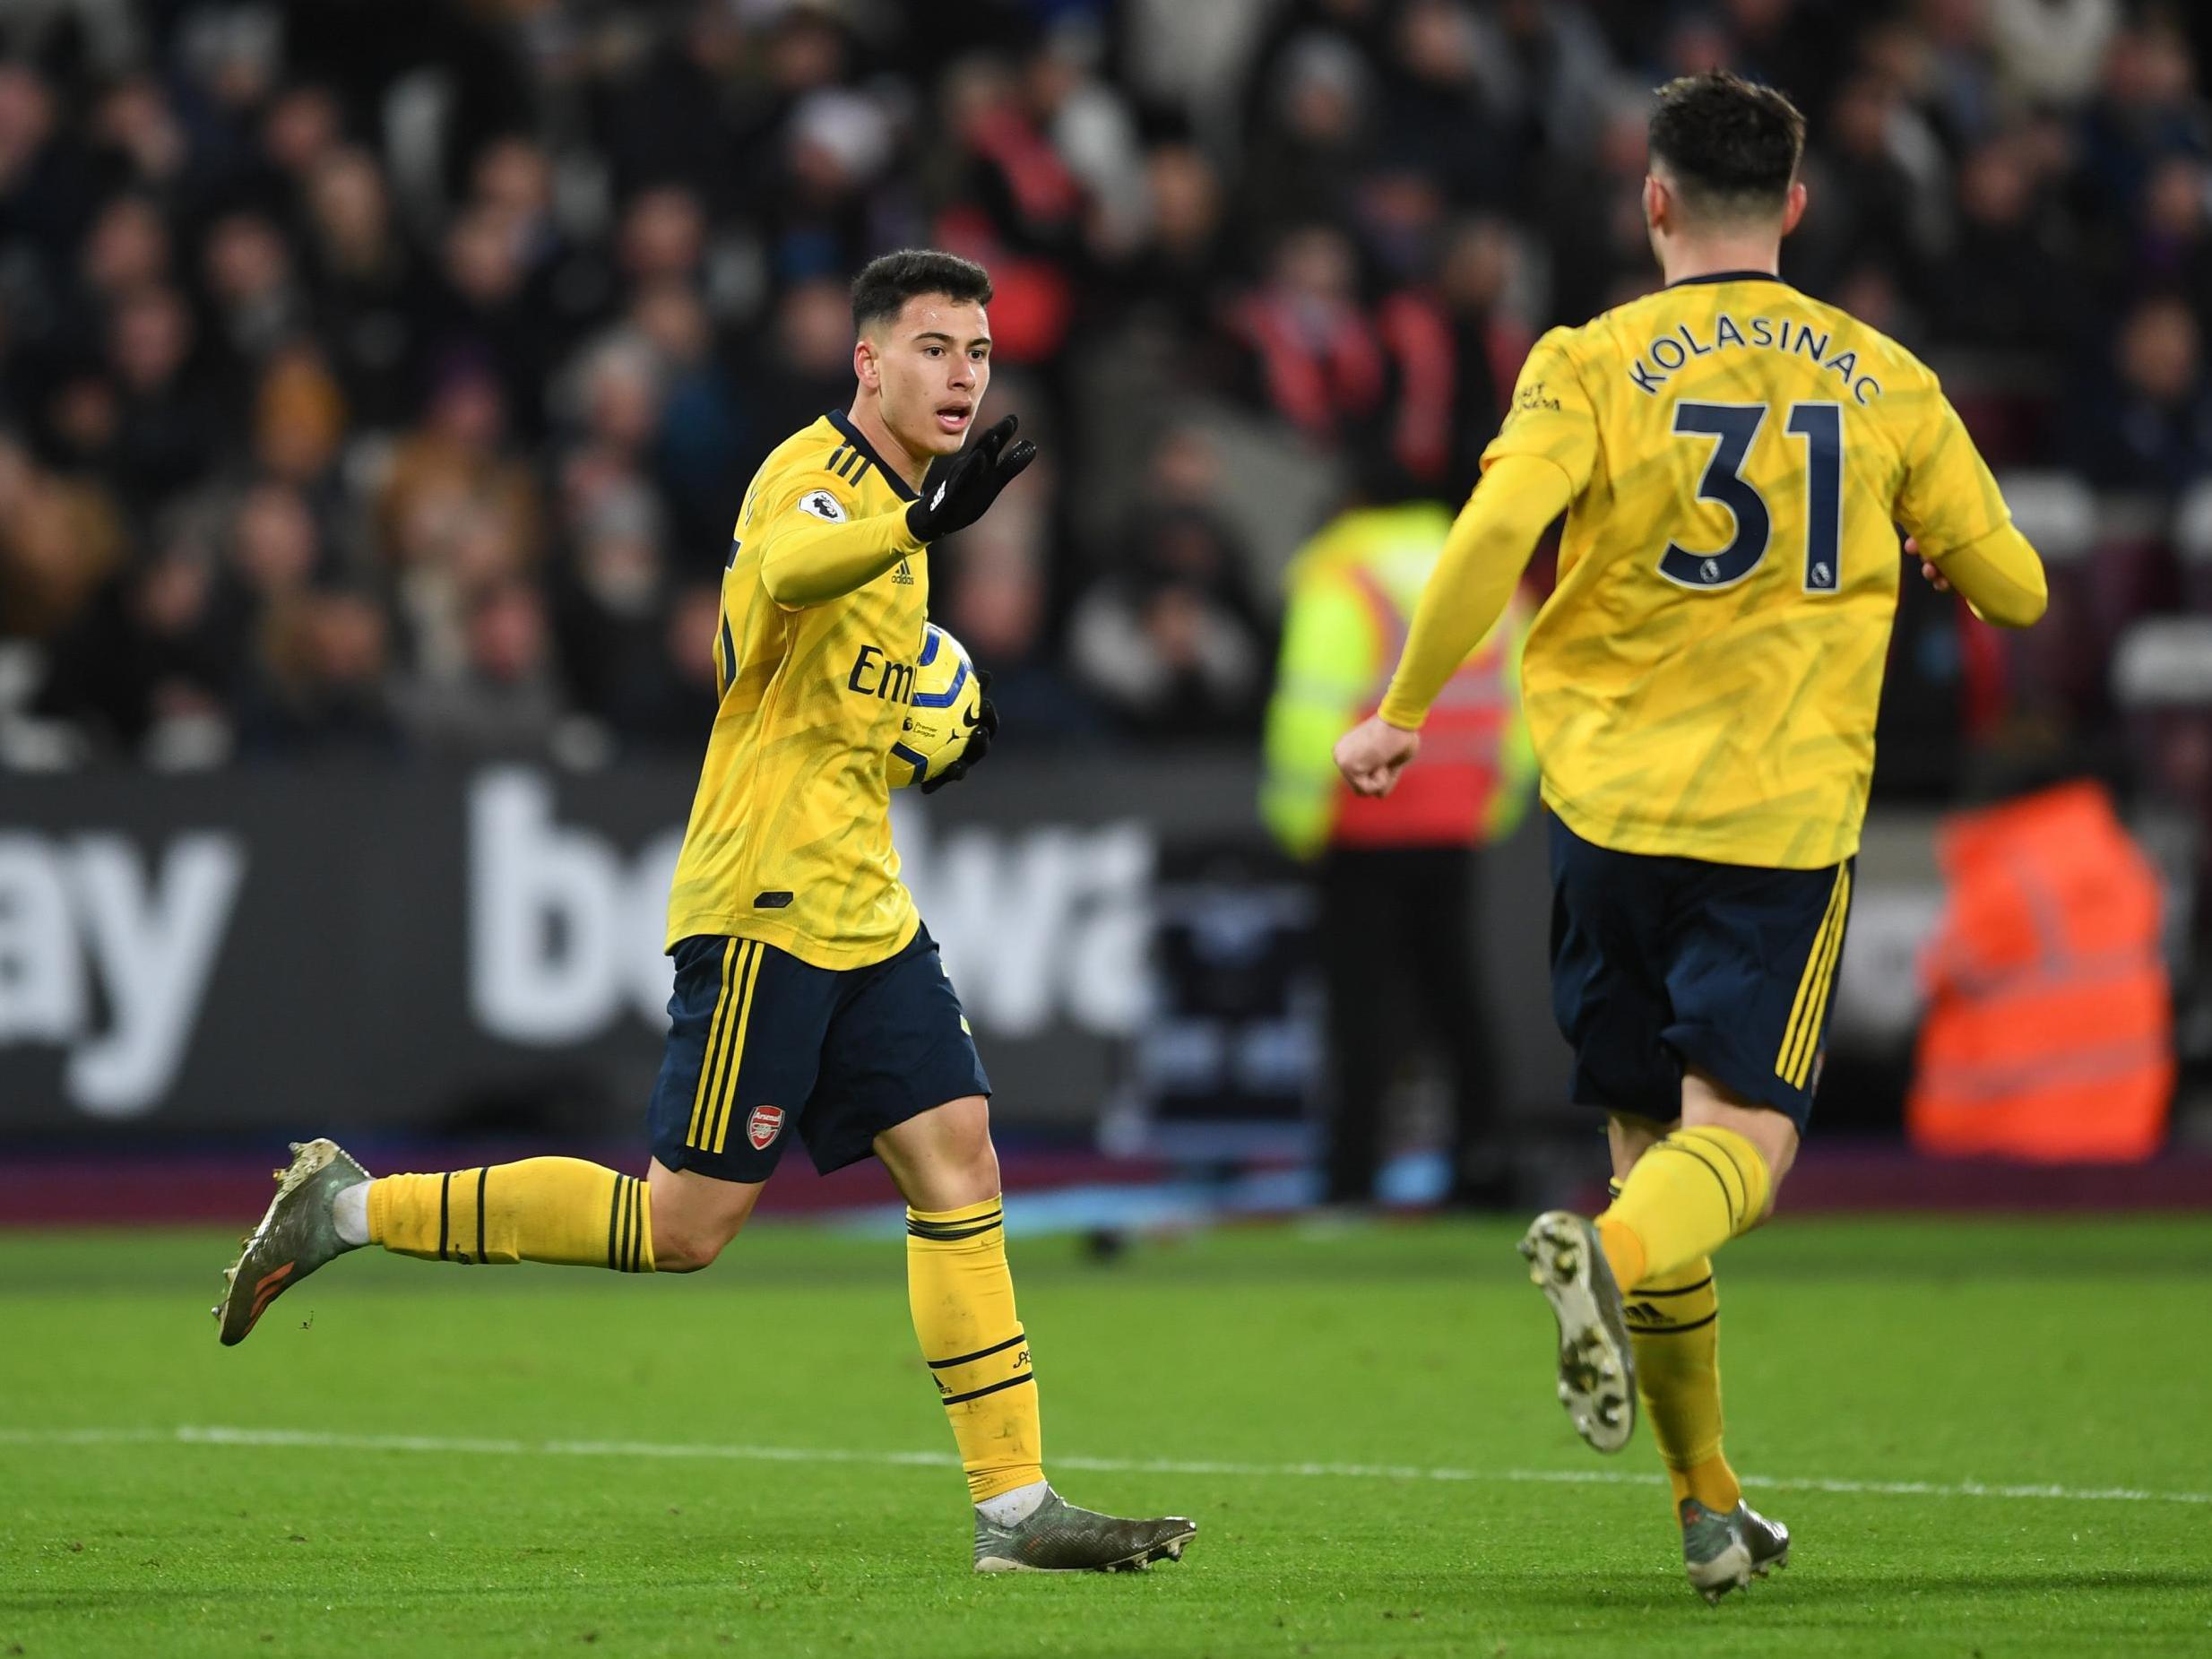 Standard Liege vs Arsenal live stream: How to watch Europa League fixture online tonight